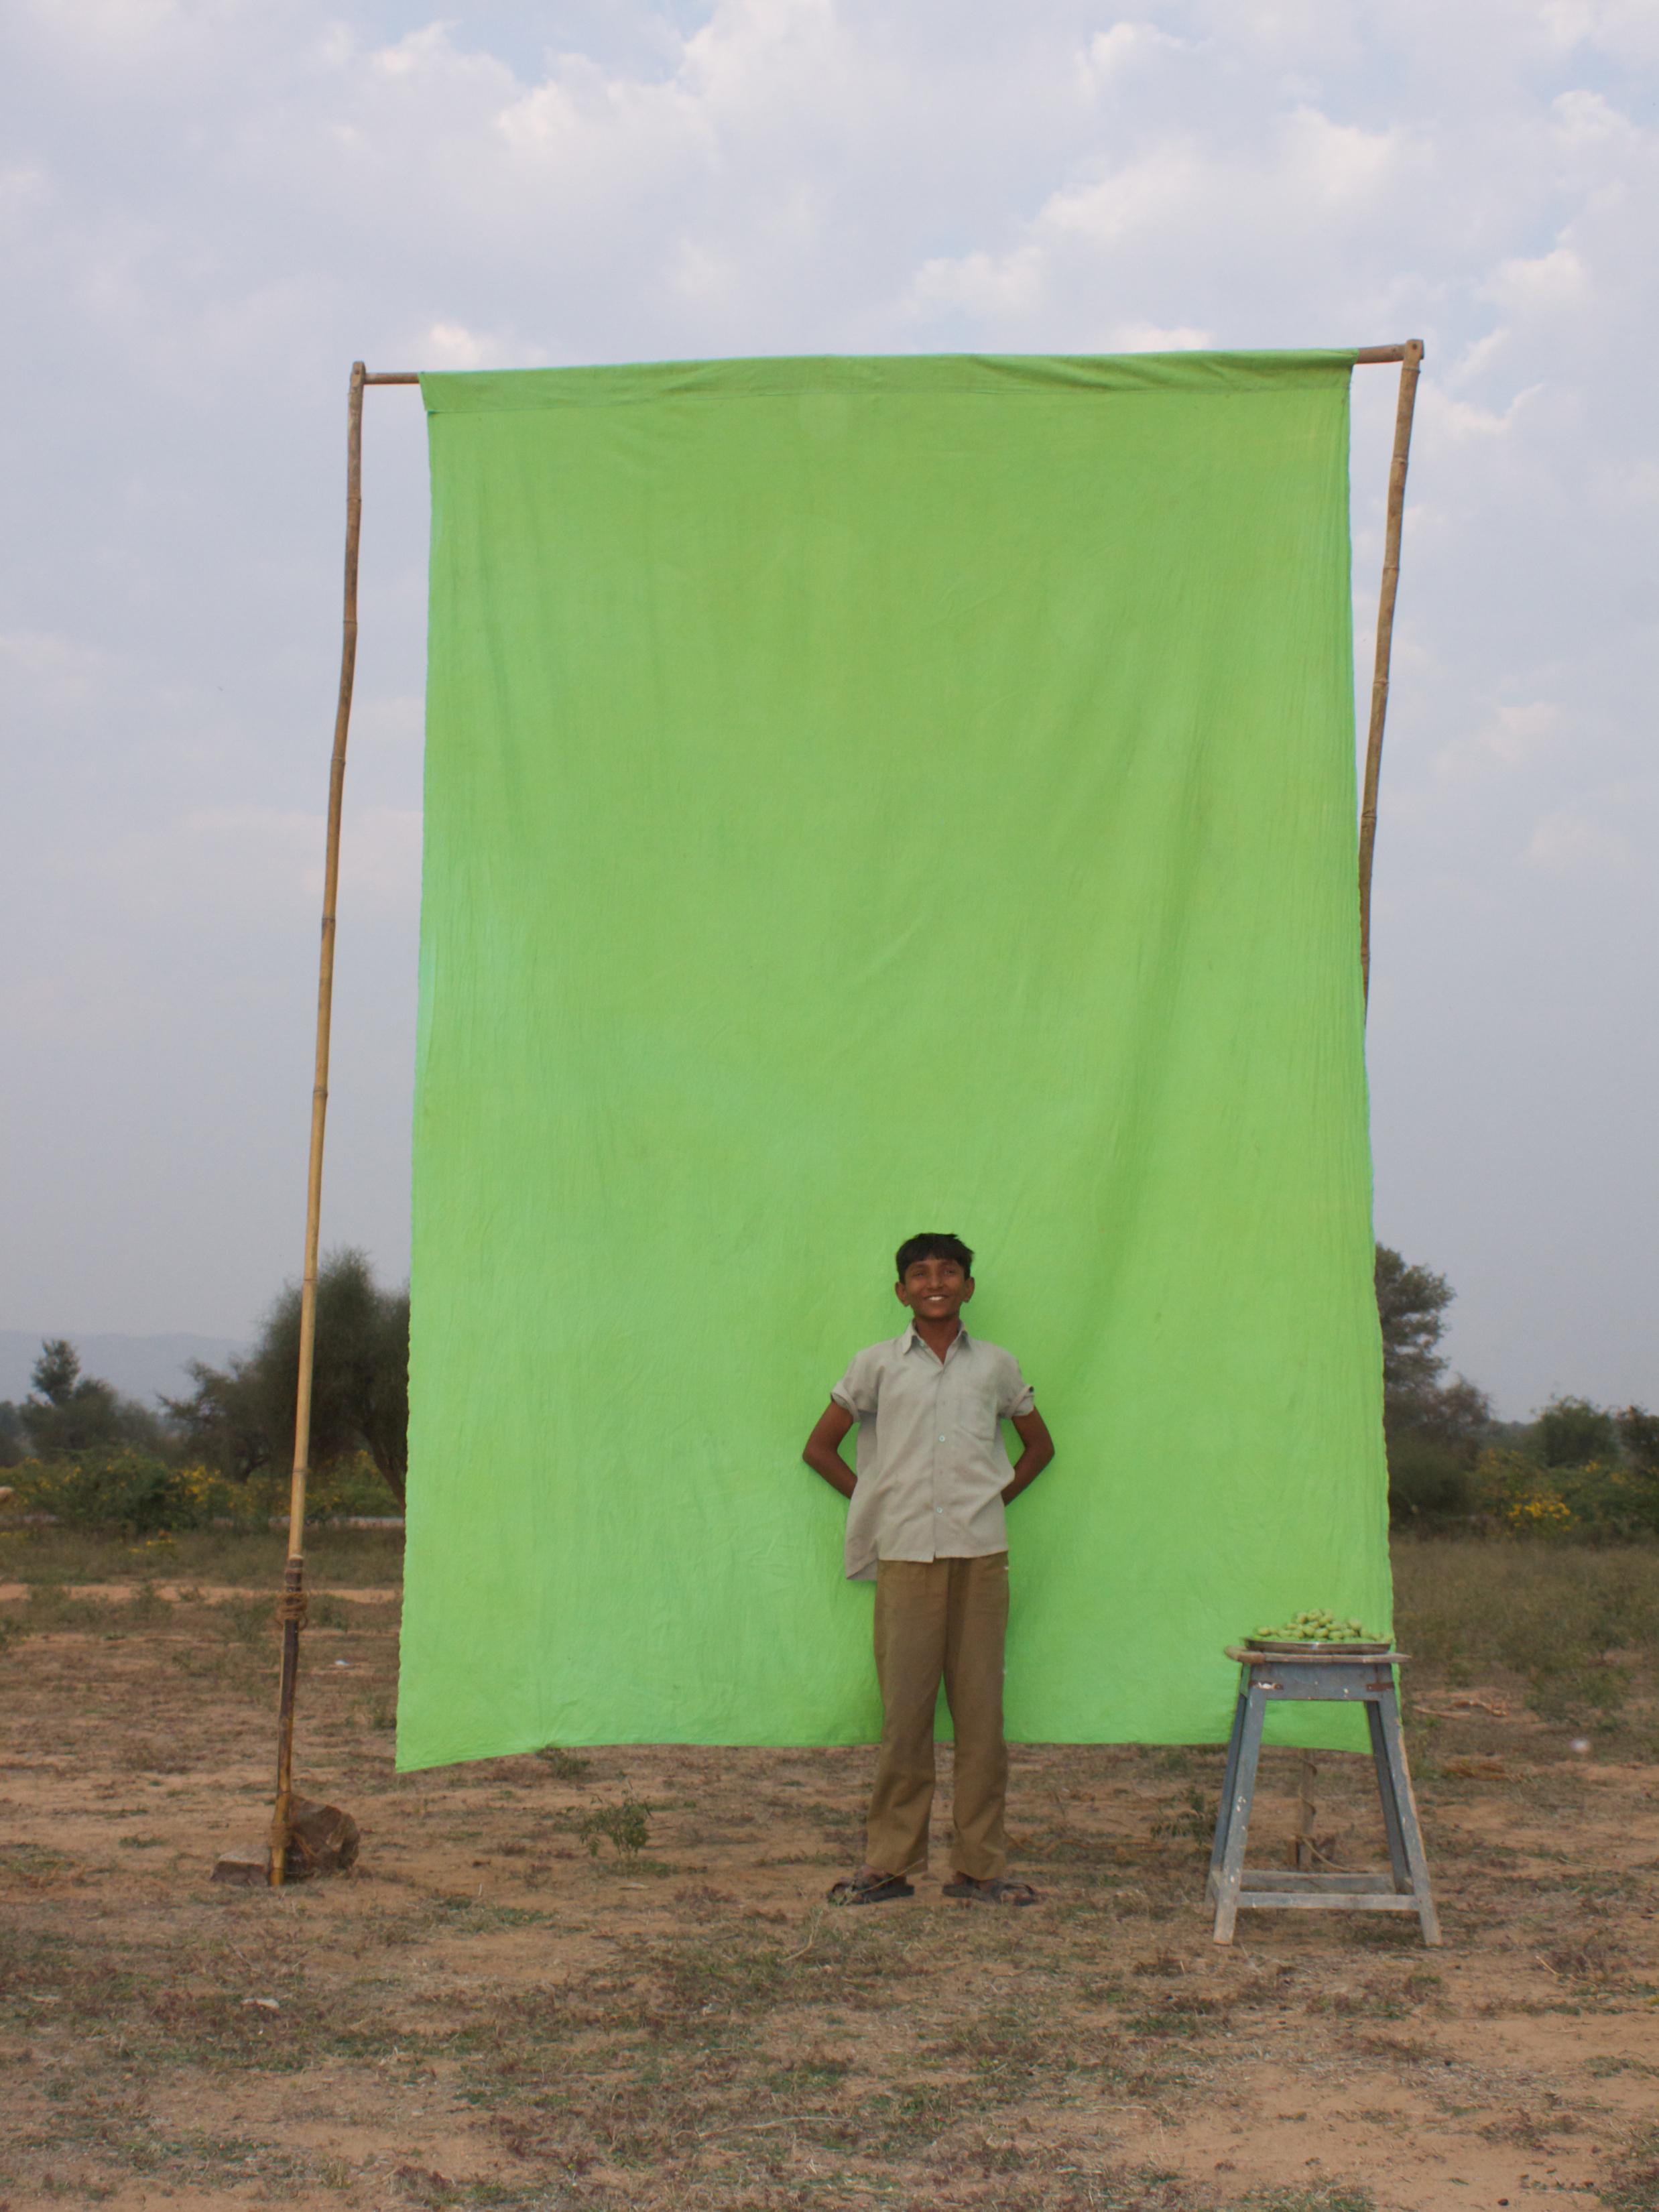 Benjamin Faga   Chroma Green No. 1    C-print    30 x 40 inches